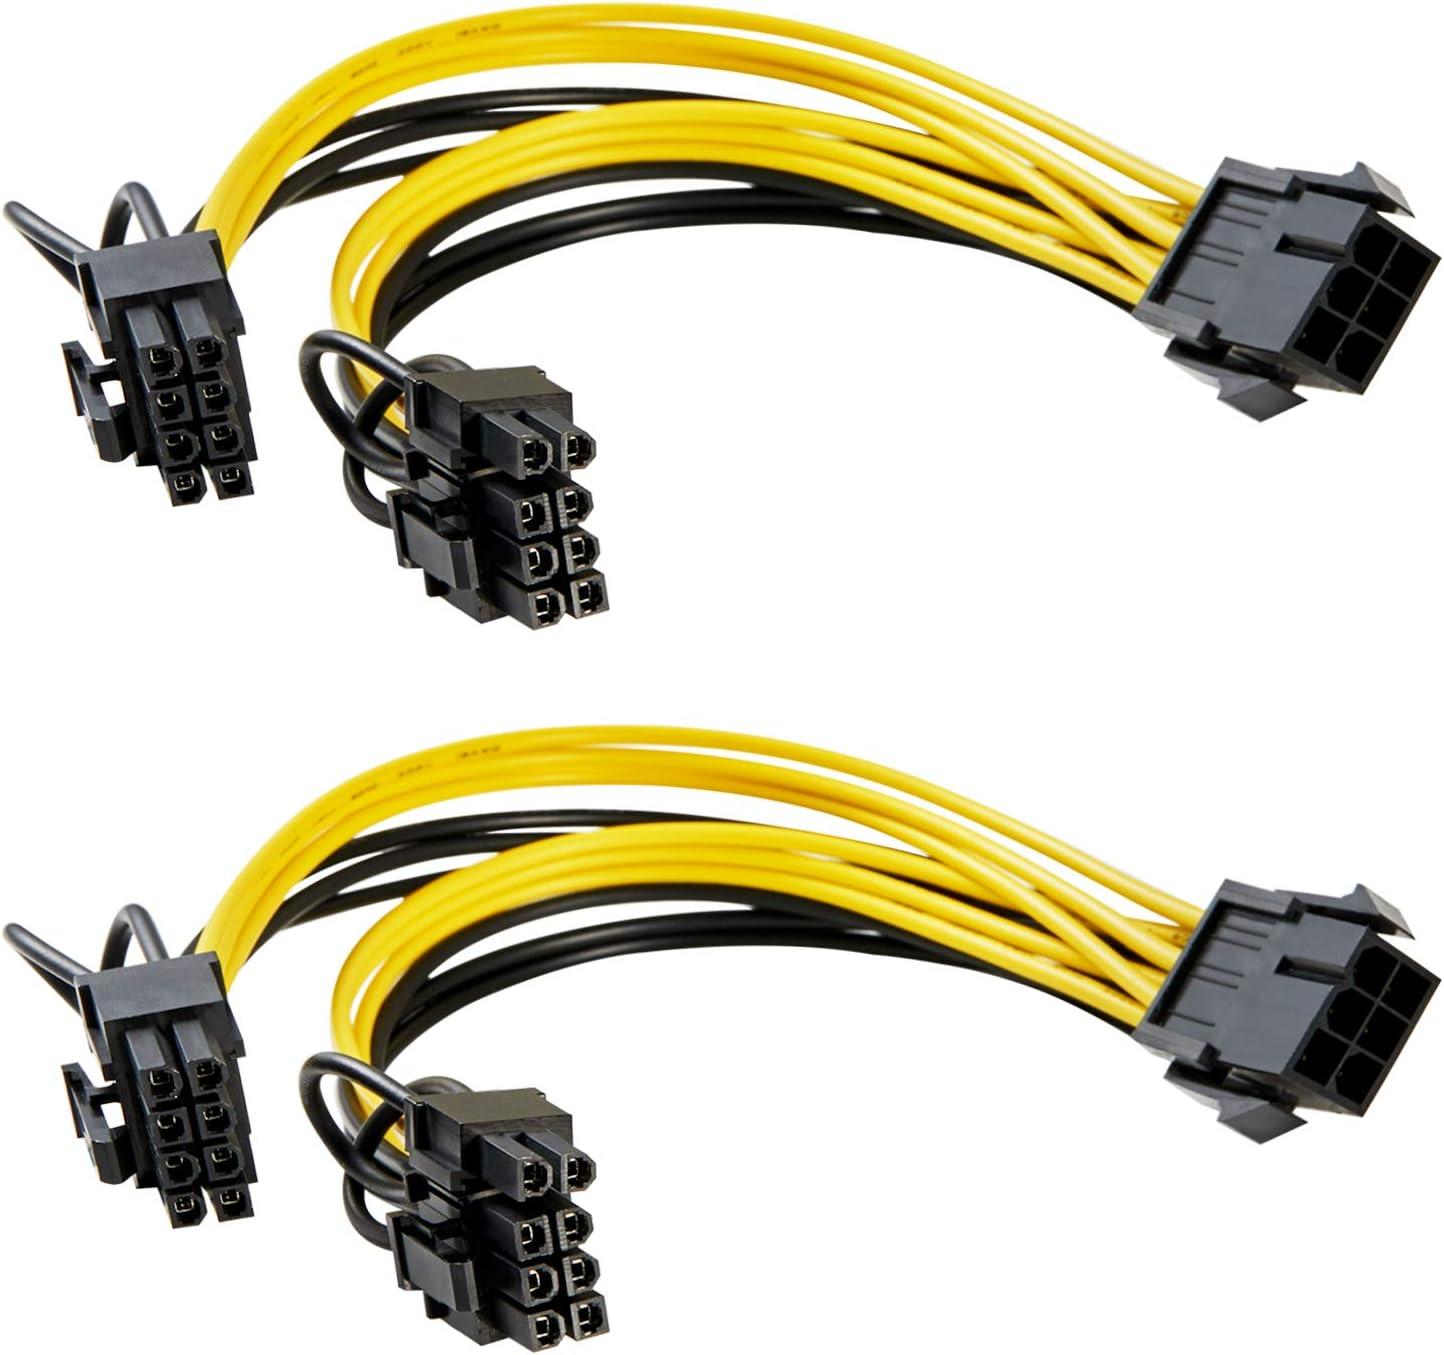 6-pin 8-pin Power Splitter Cable PCIE PCI Express 20cm PCI-E 6-pin to 2x 6